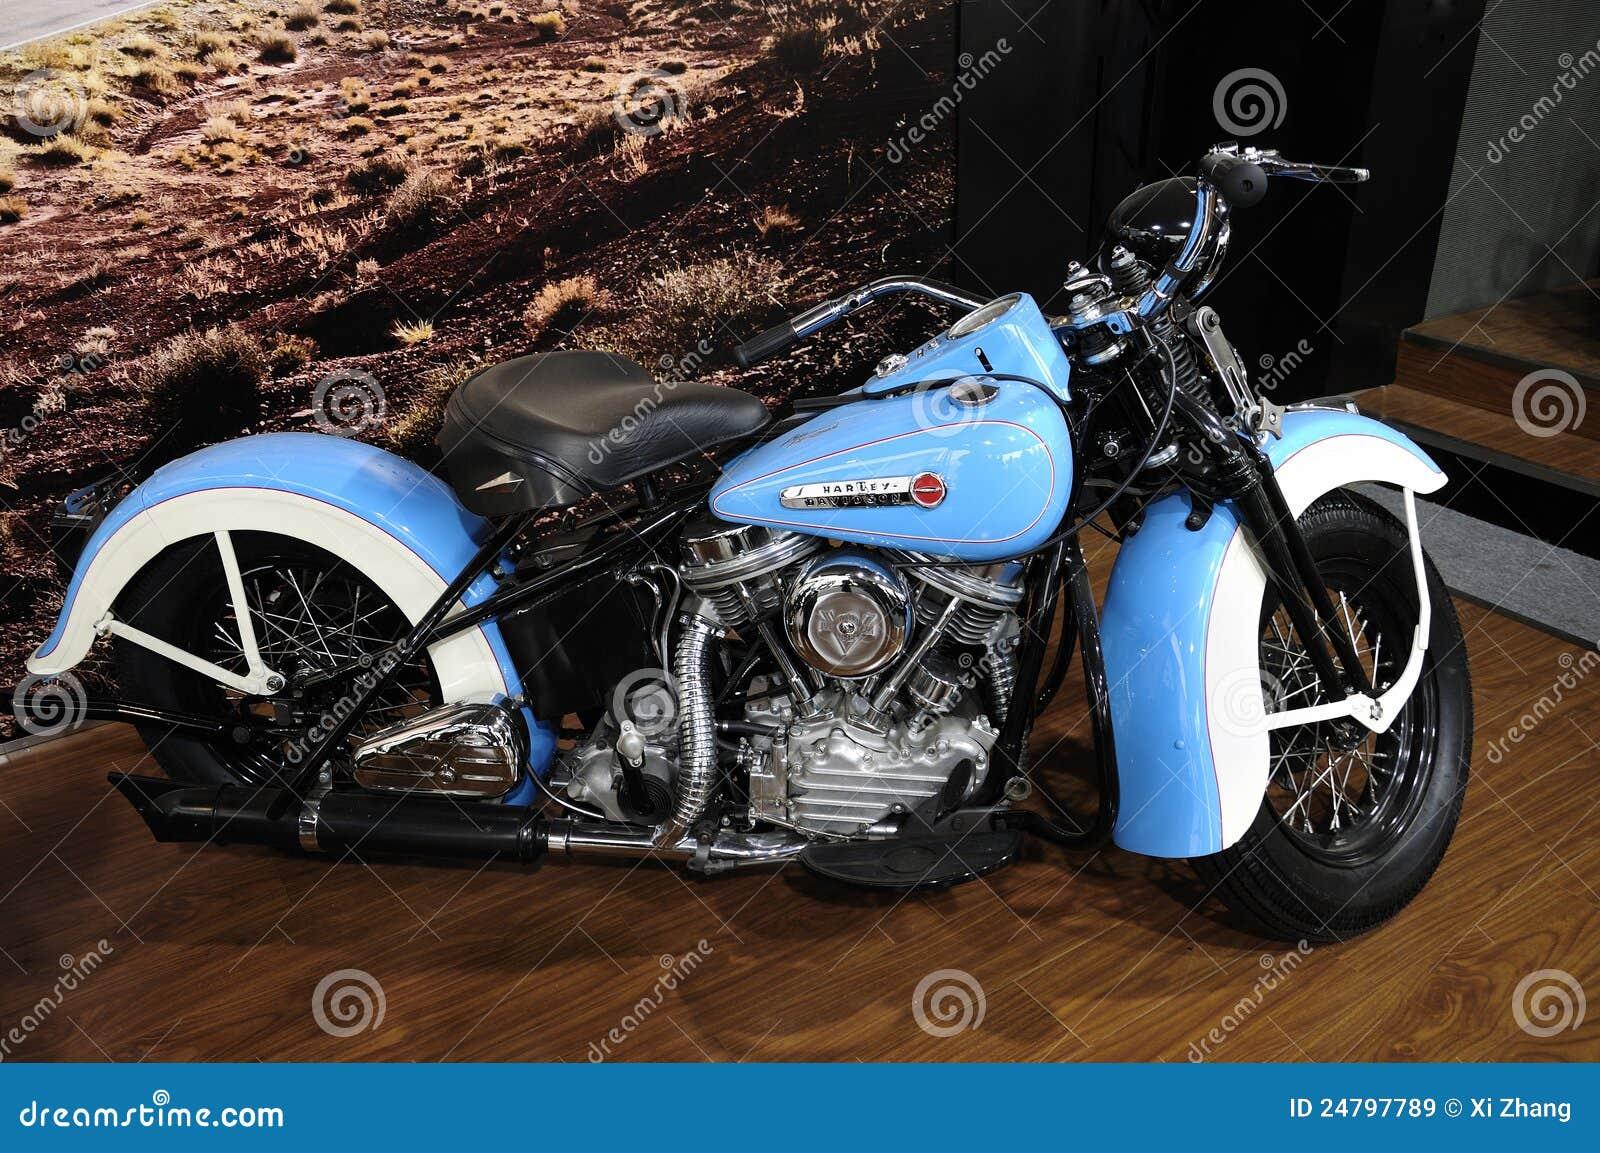 Harley Davidson motorcycleï ¼ AutoChina 2012